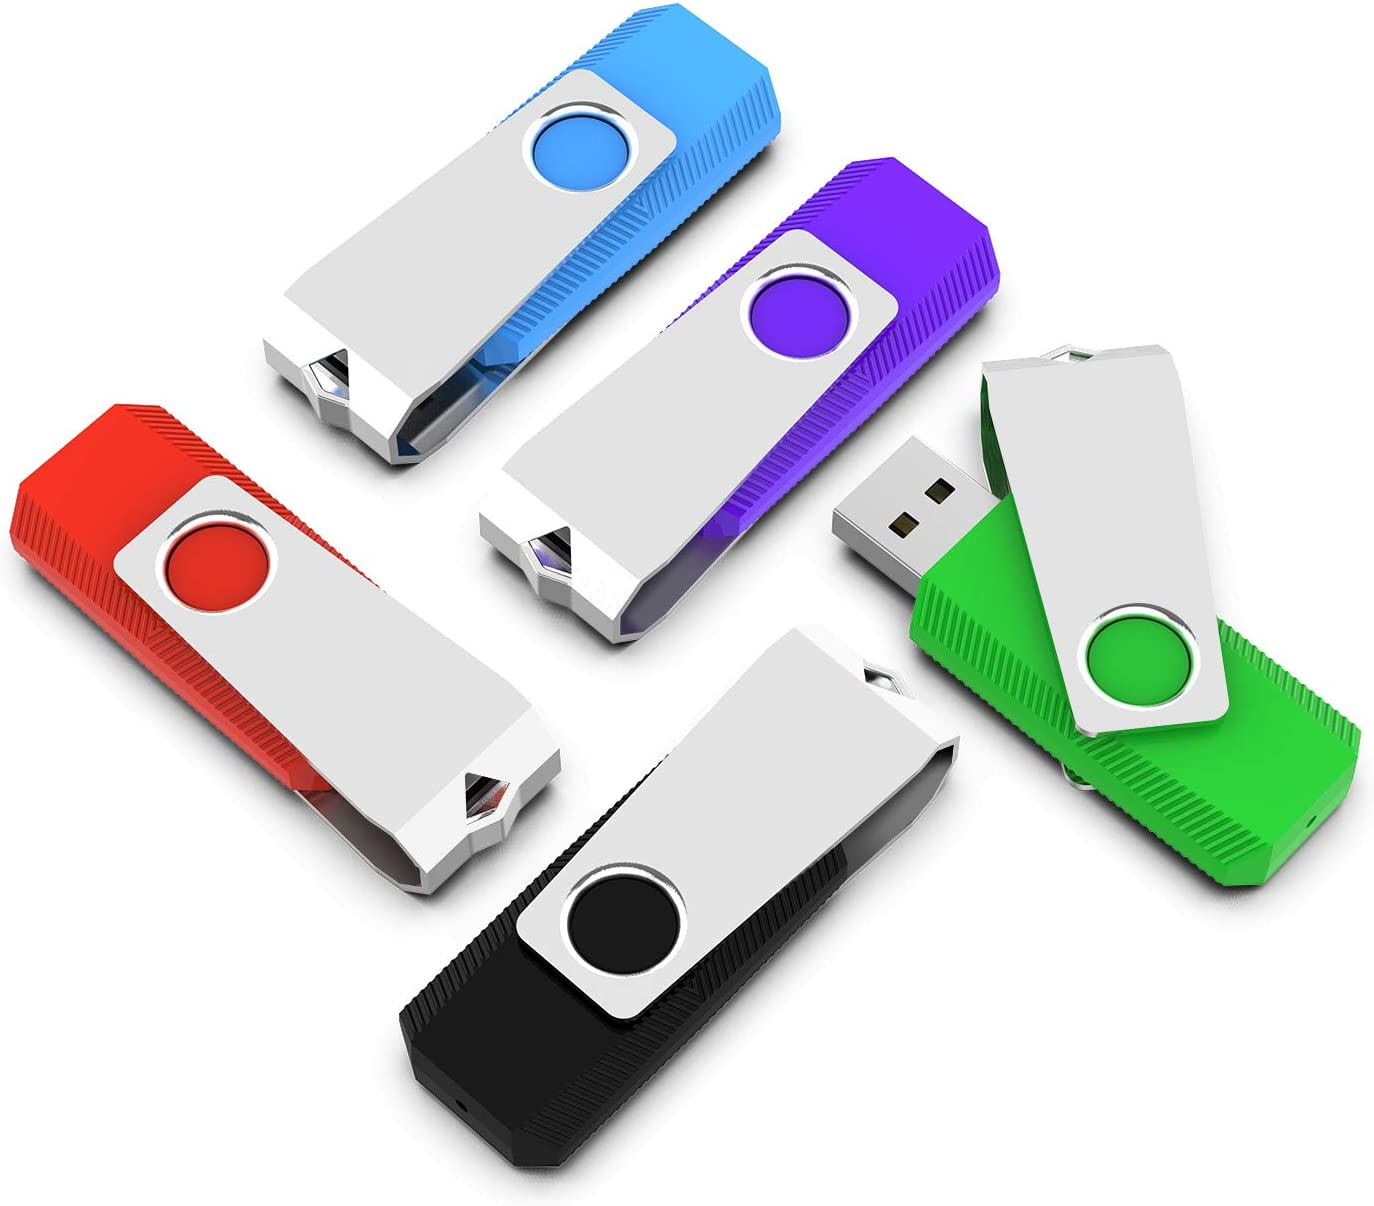 64G Blue//Red RAOYI 2 Pack 64GB USB 3.0 Flash Drives Swivel Memory Stick 64 gb Thumb Drives Data Storage Transfer Speeds Up to 90 MB//s